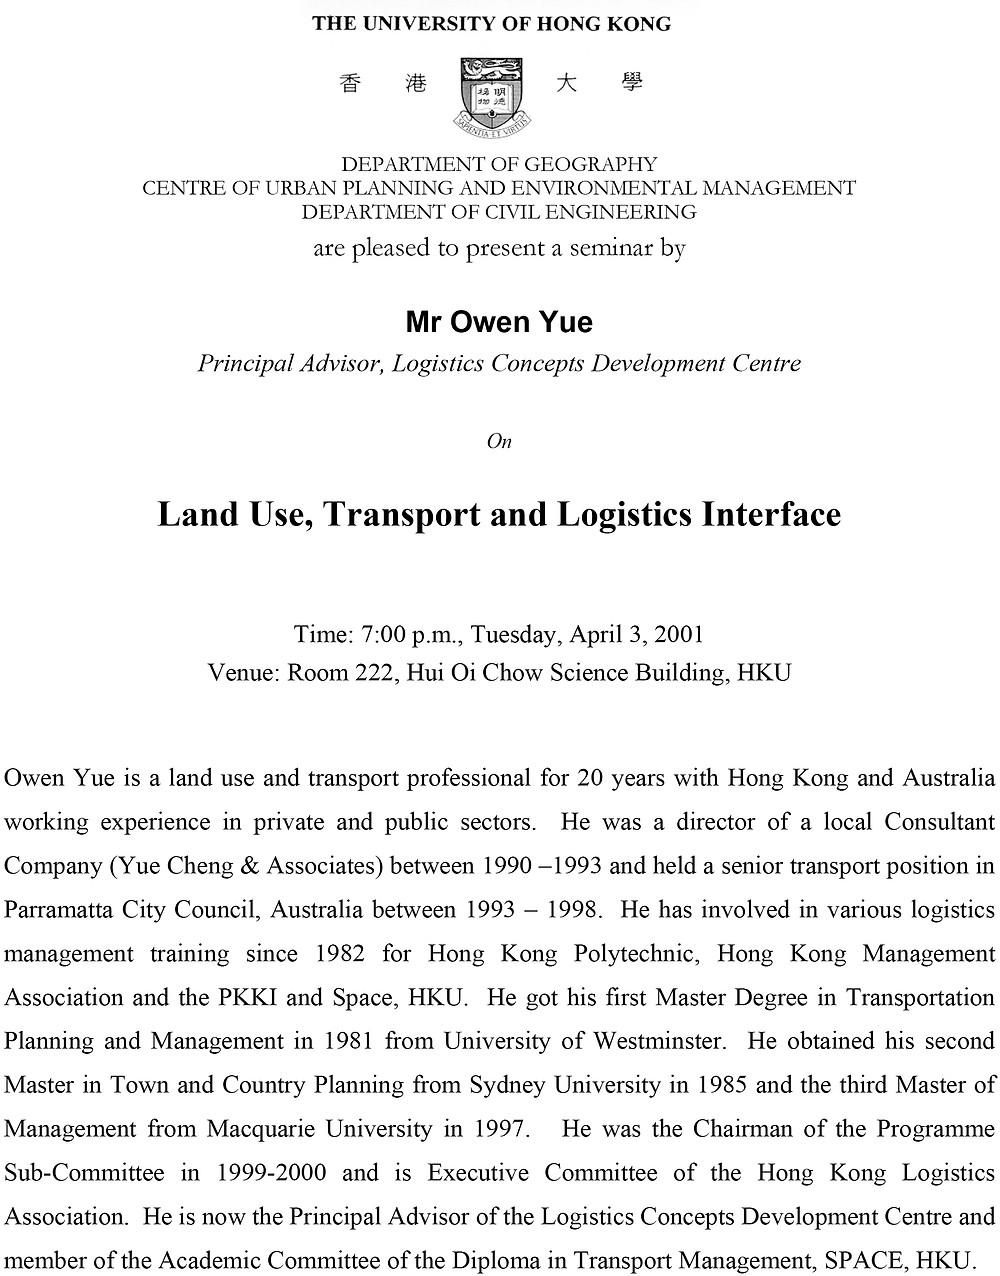 20010403 Seminar Poster